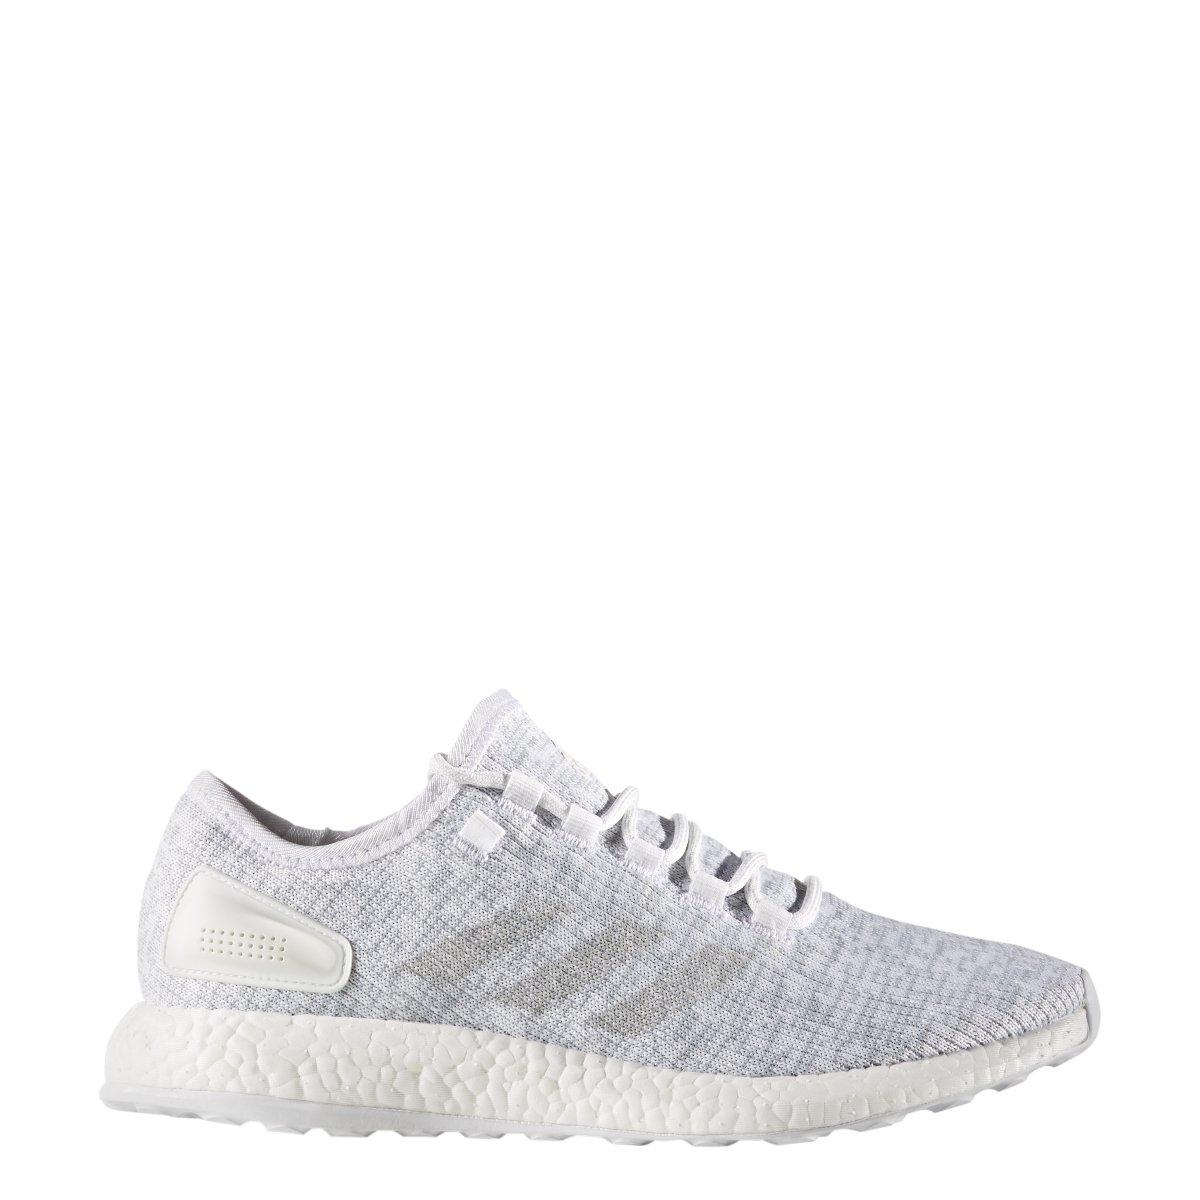 adidas Performance Men's Pureboost Running Shoe B06WRQN6VM 12.5 D(M) US|White-clear Grey-white